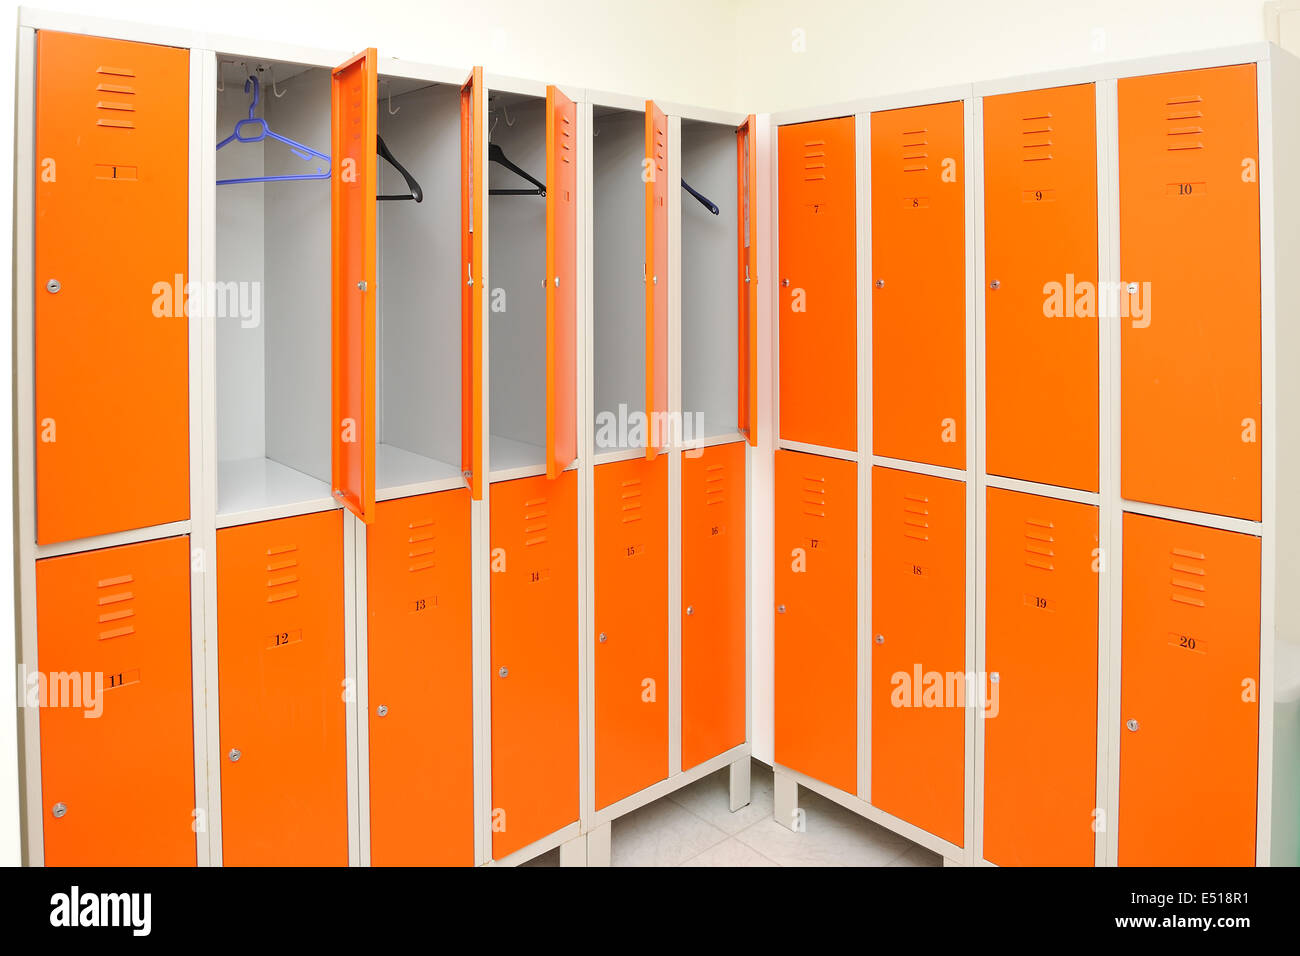 Lockers - Stock Image